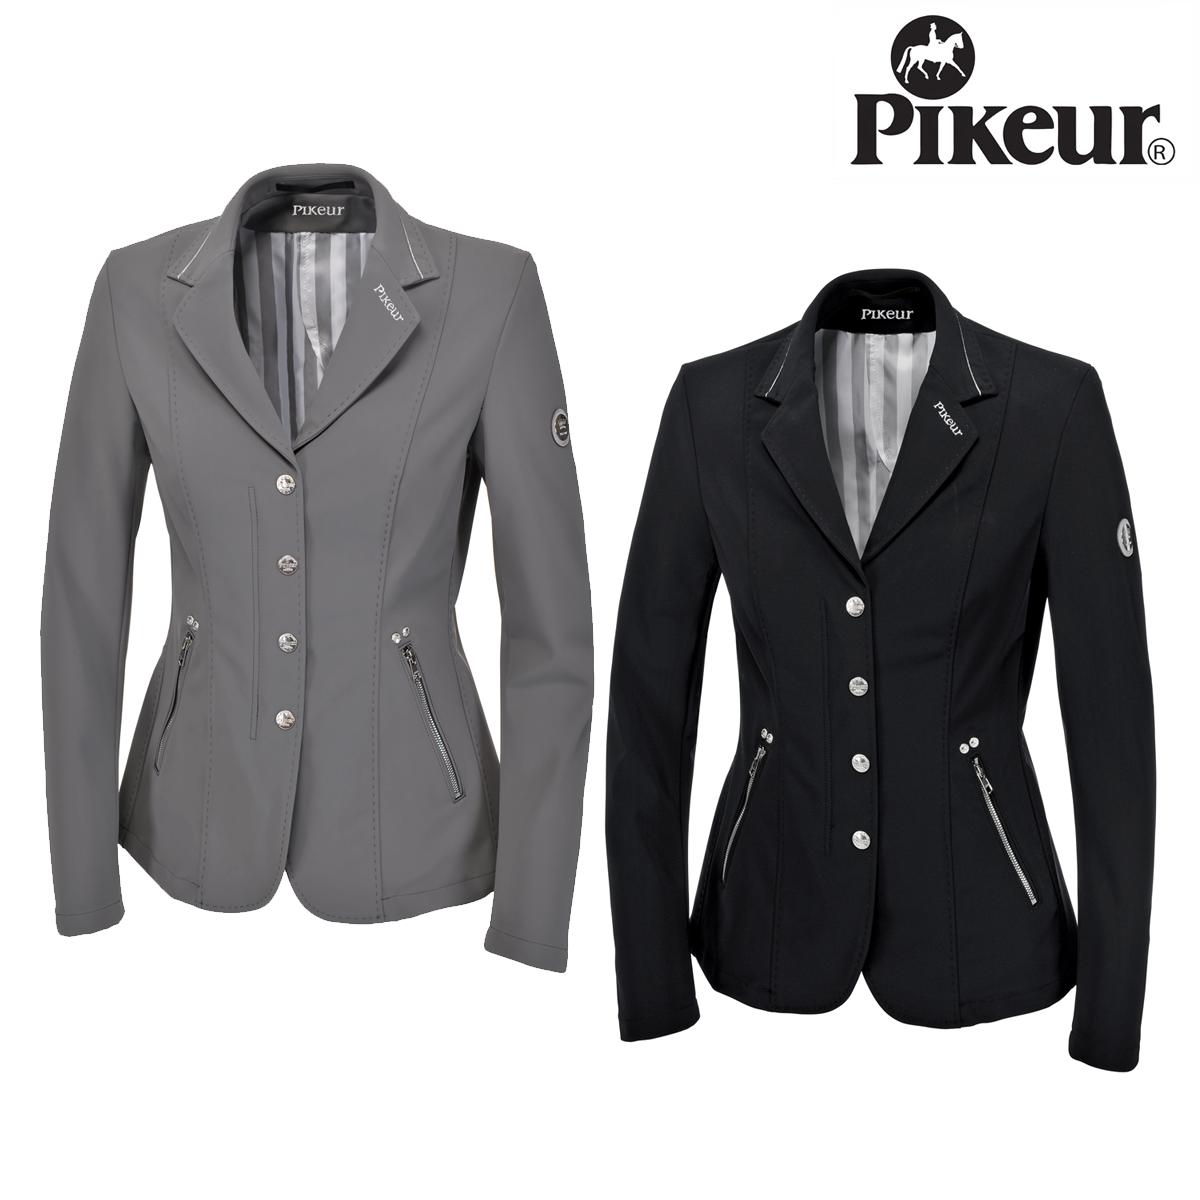 pikeur_quibelle_jacket_group